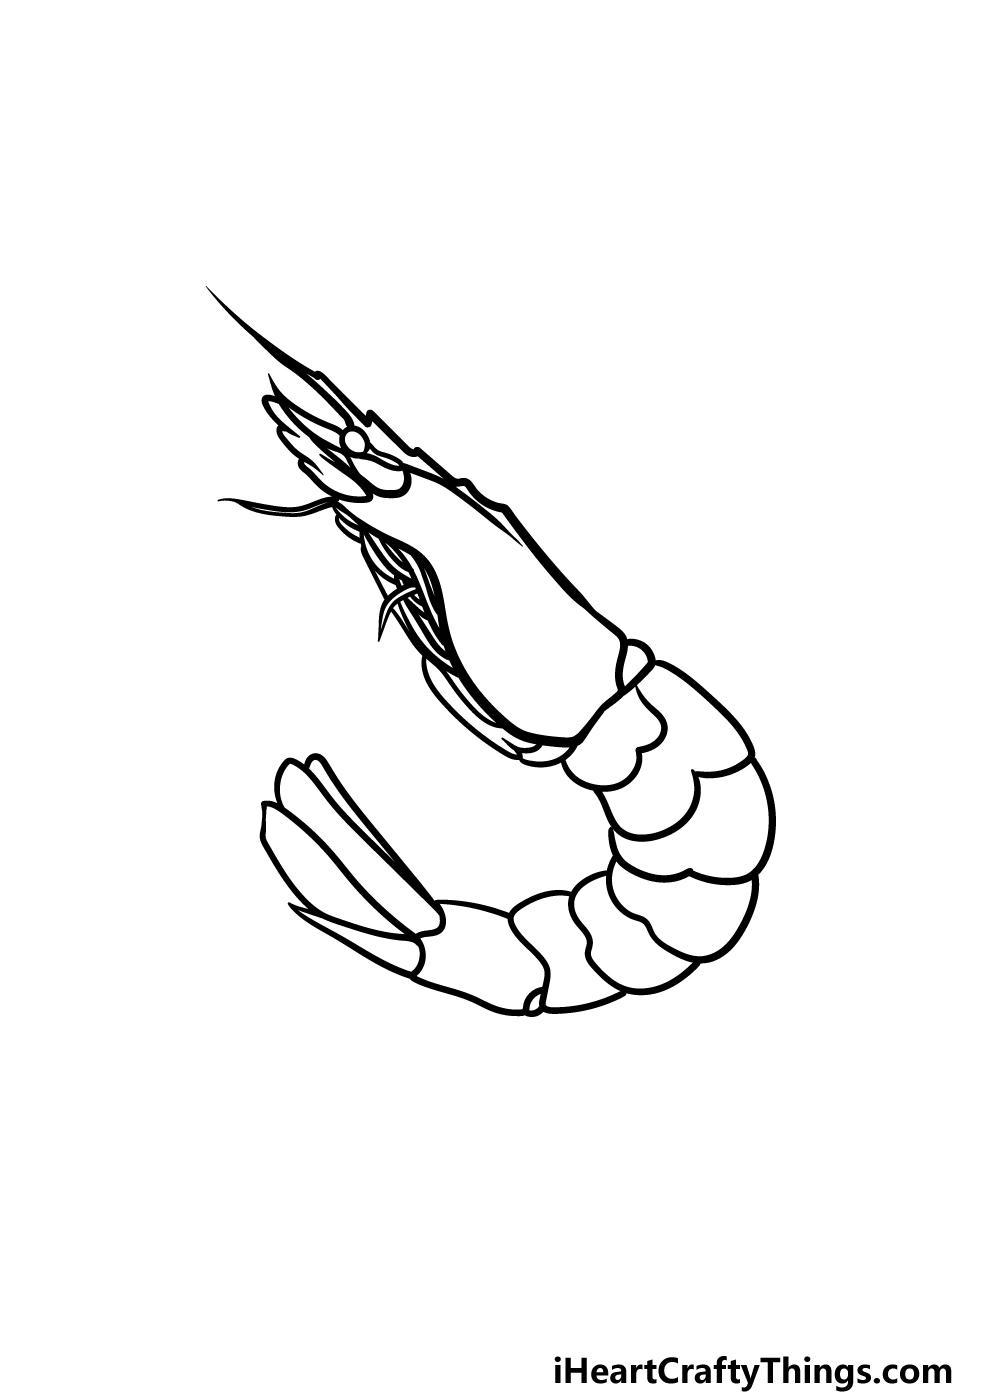 drawing a shrimp step 4